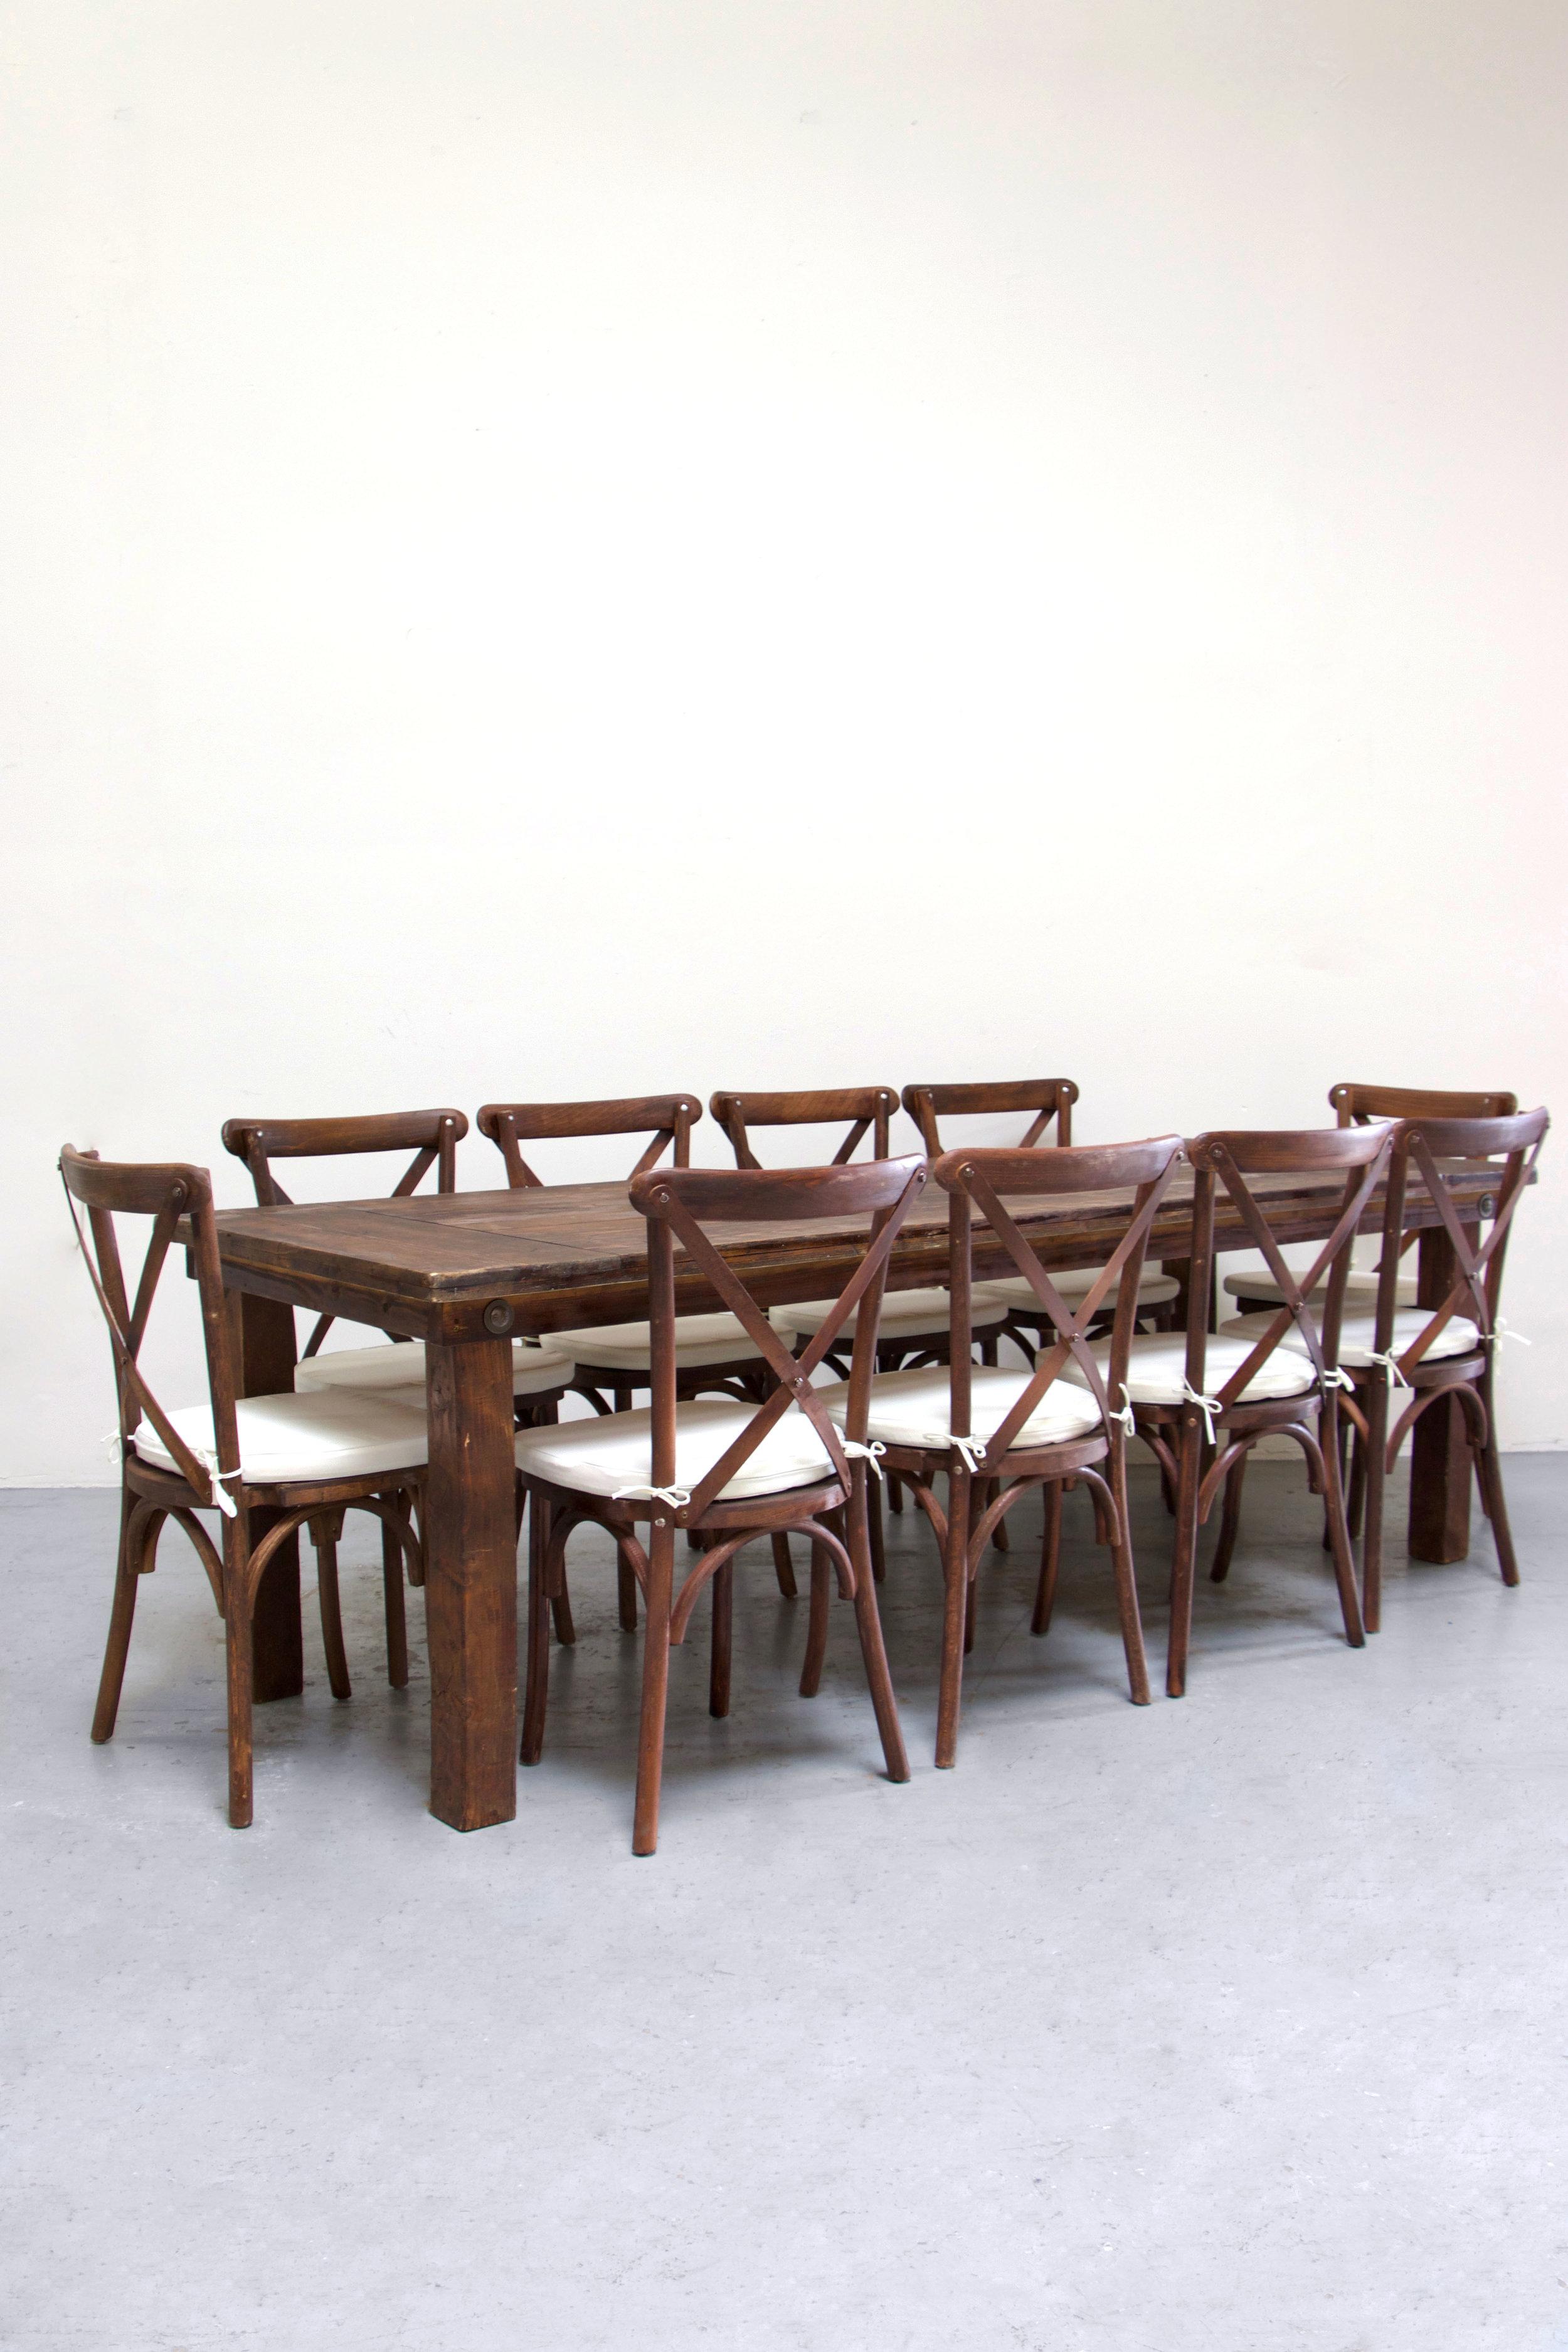 $160 1 Mahogany Farm Table w/ 10 Cross-Back Chairs